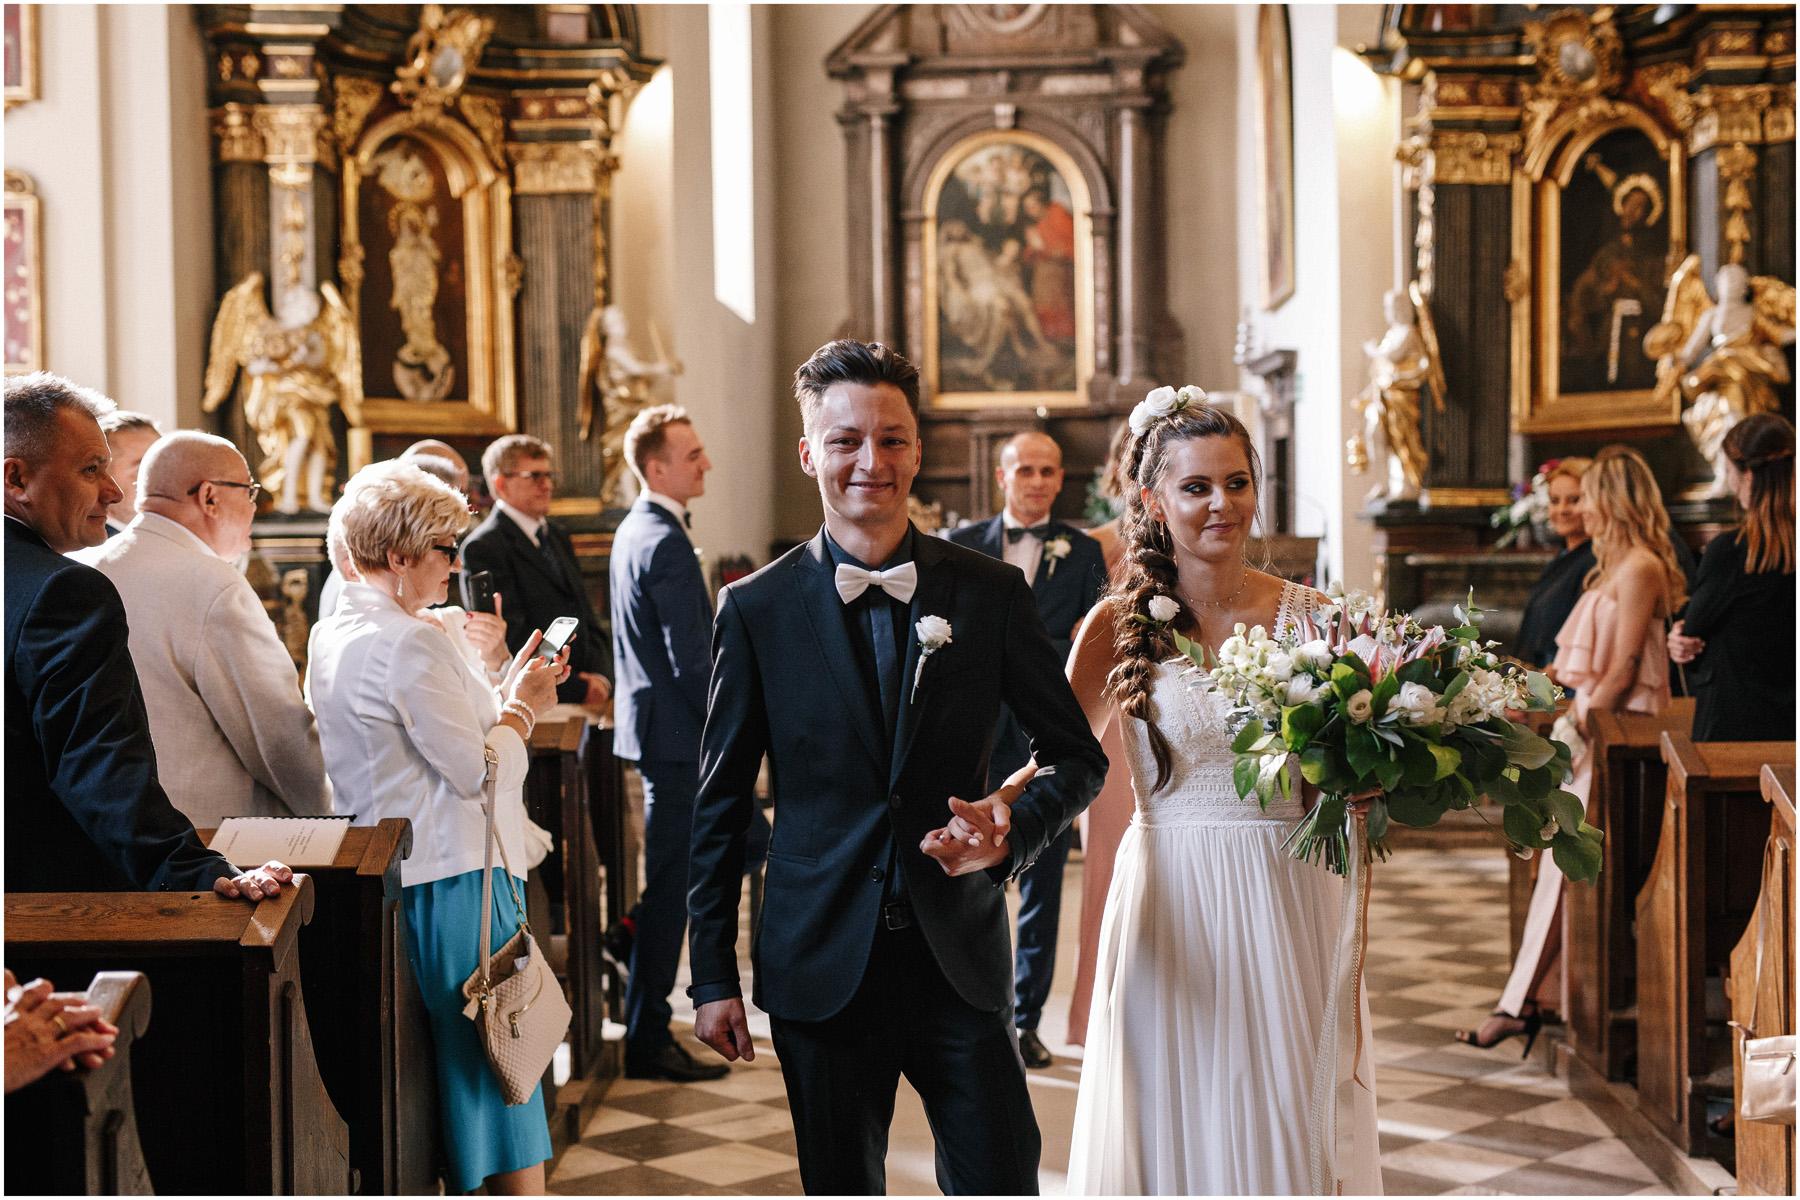 , Karolina & Wojtek | ślub miejski w Willi Hueta